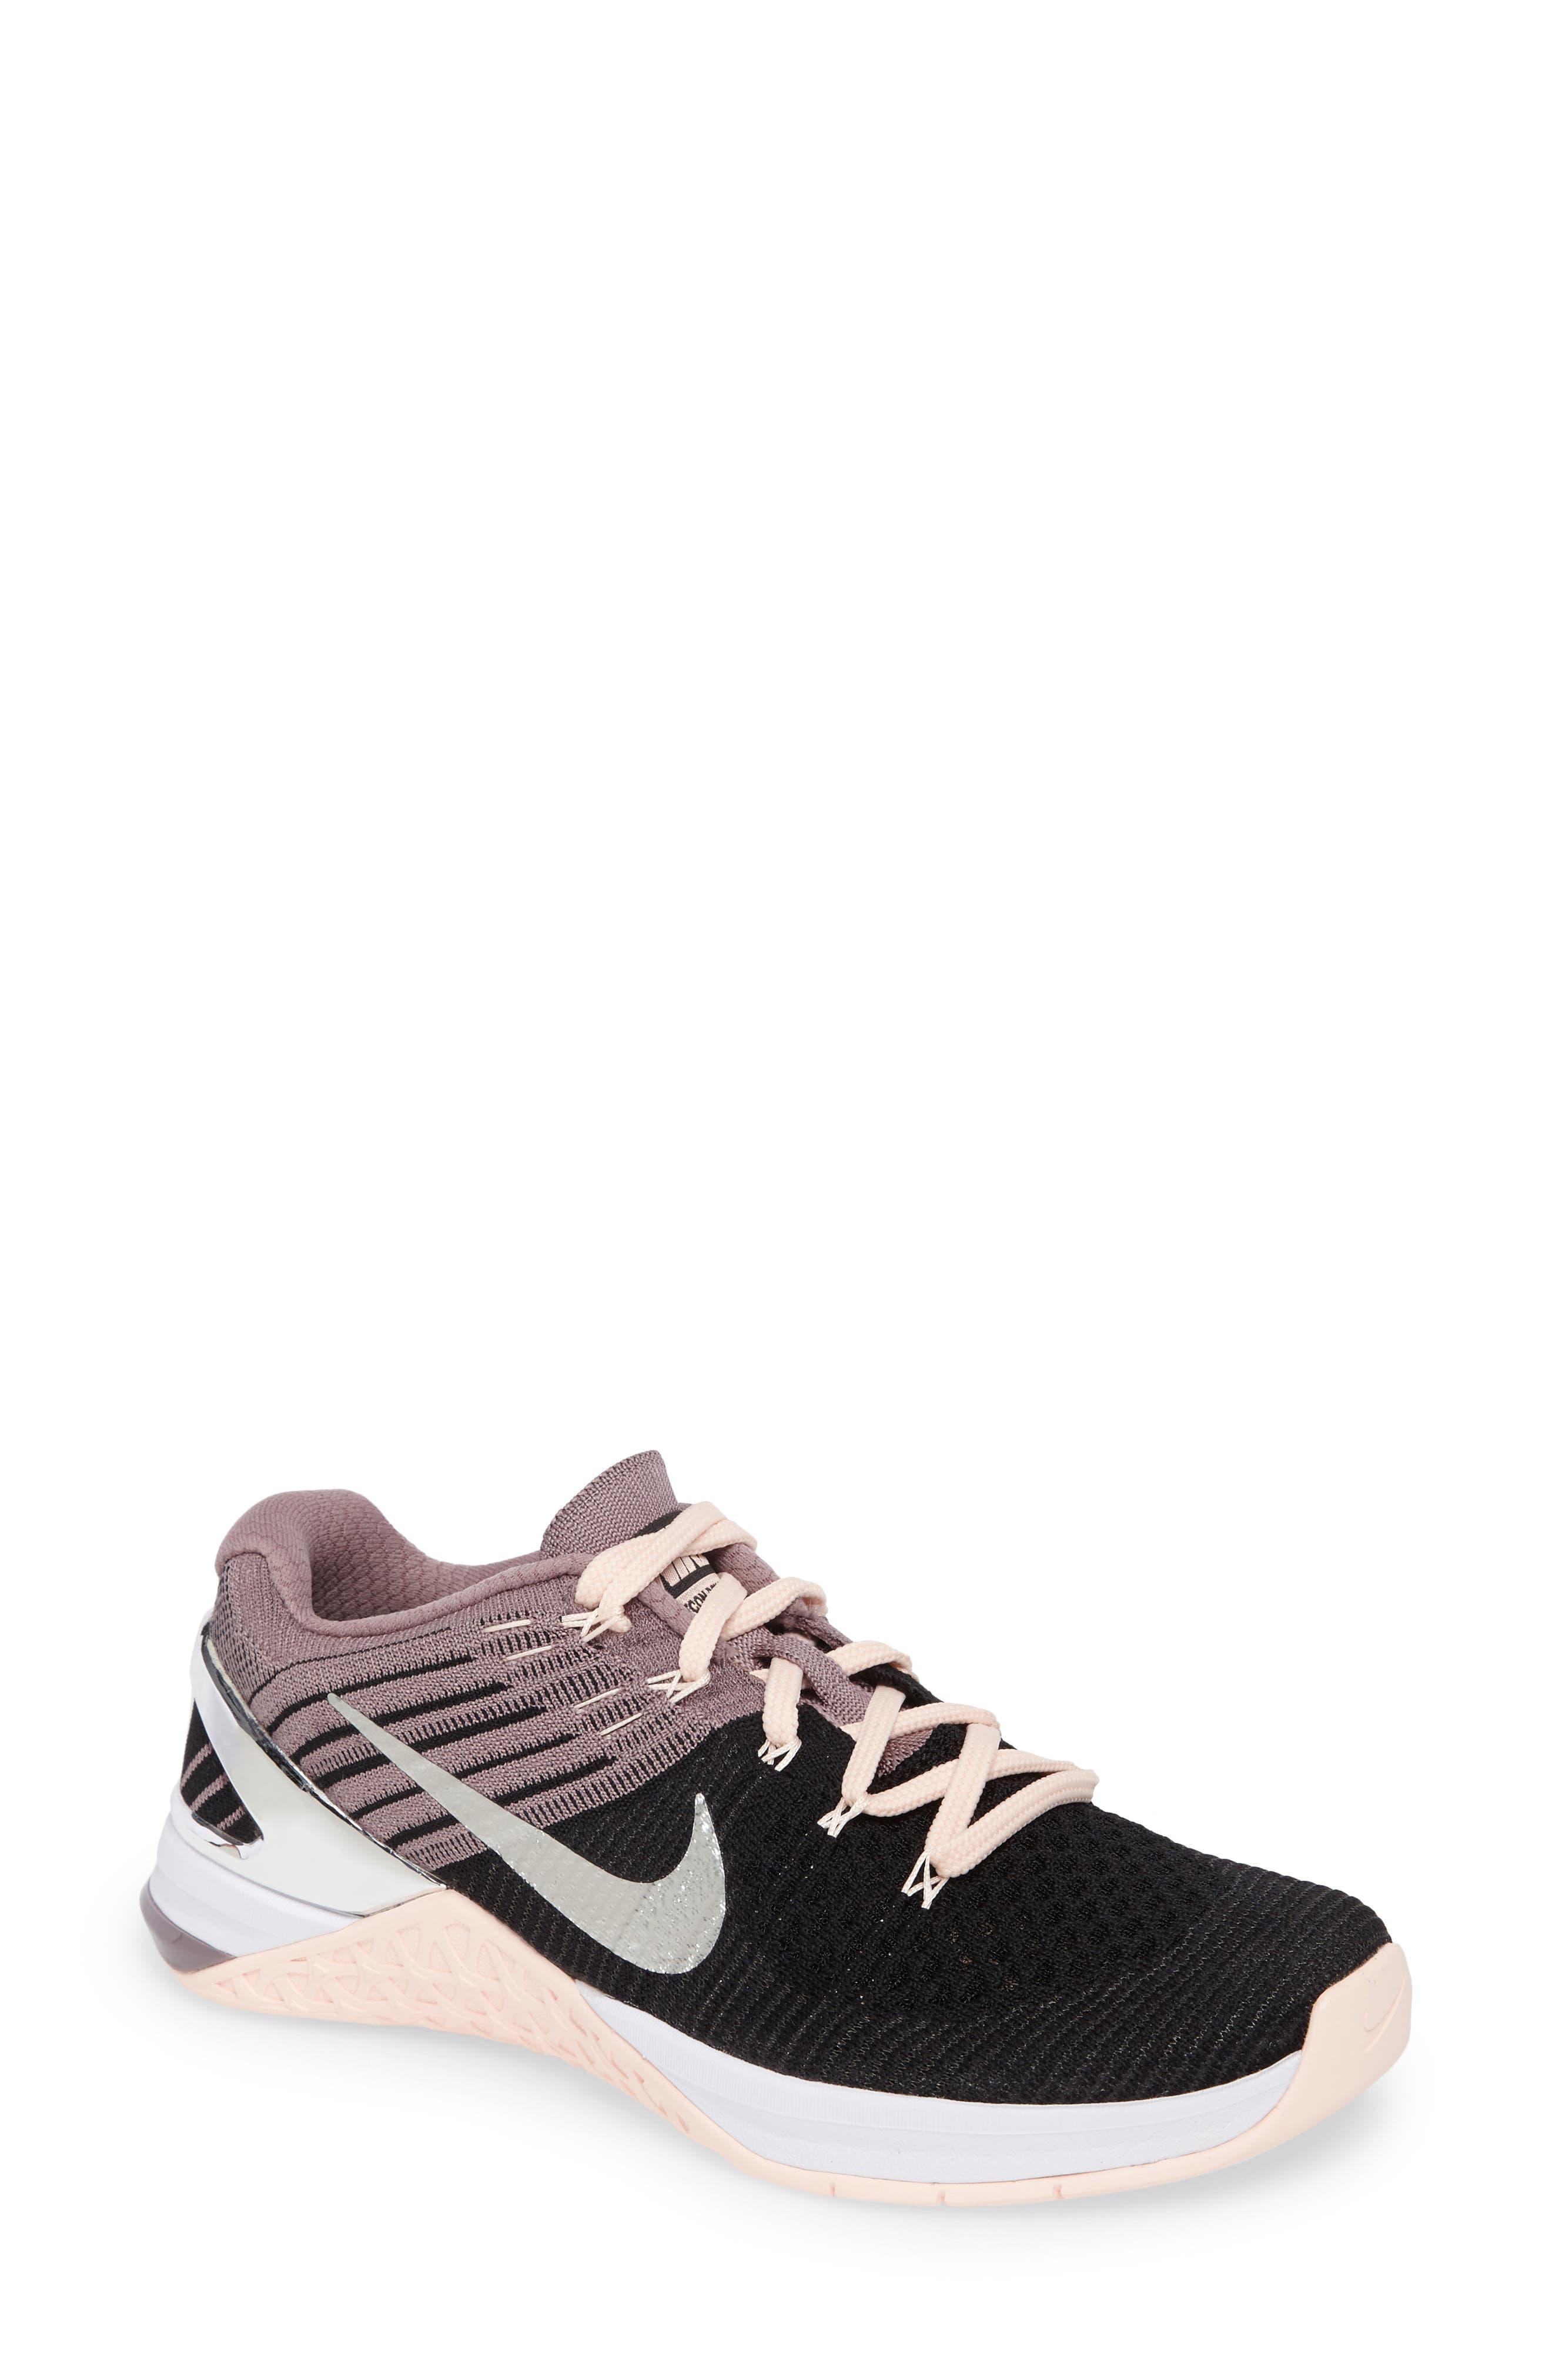 Nike Metcon DSX Flyknit Chrome Blush Training Shoe (Women ...